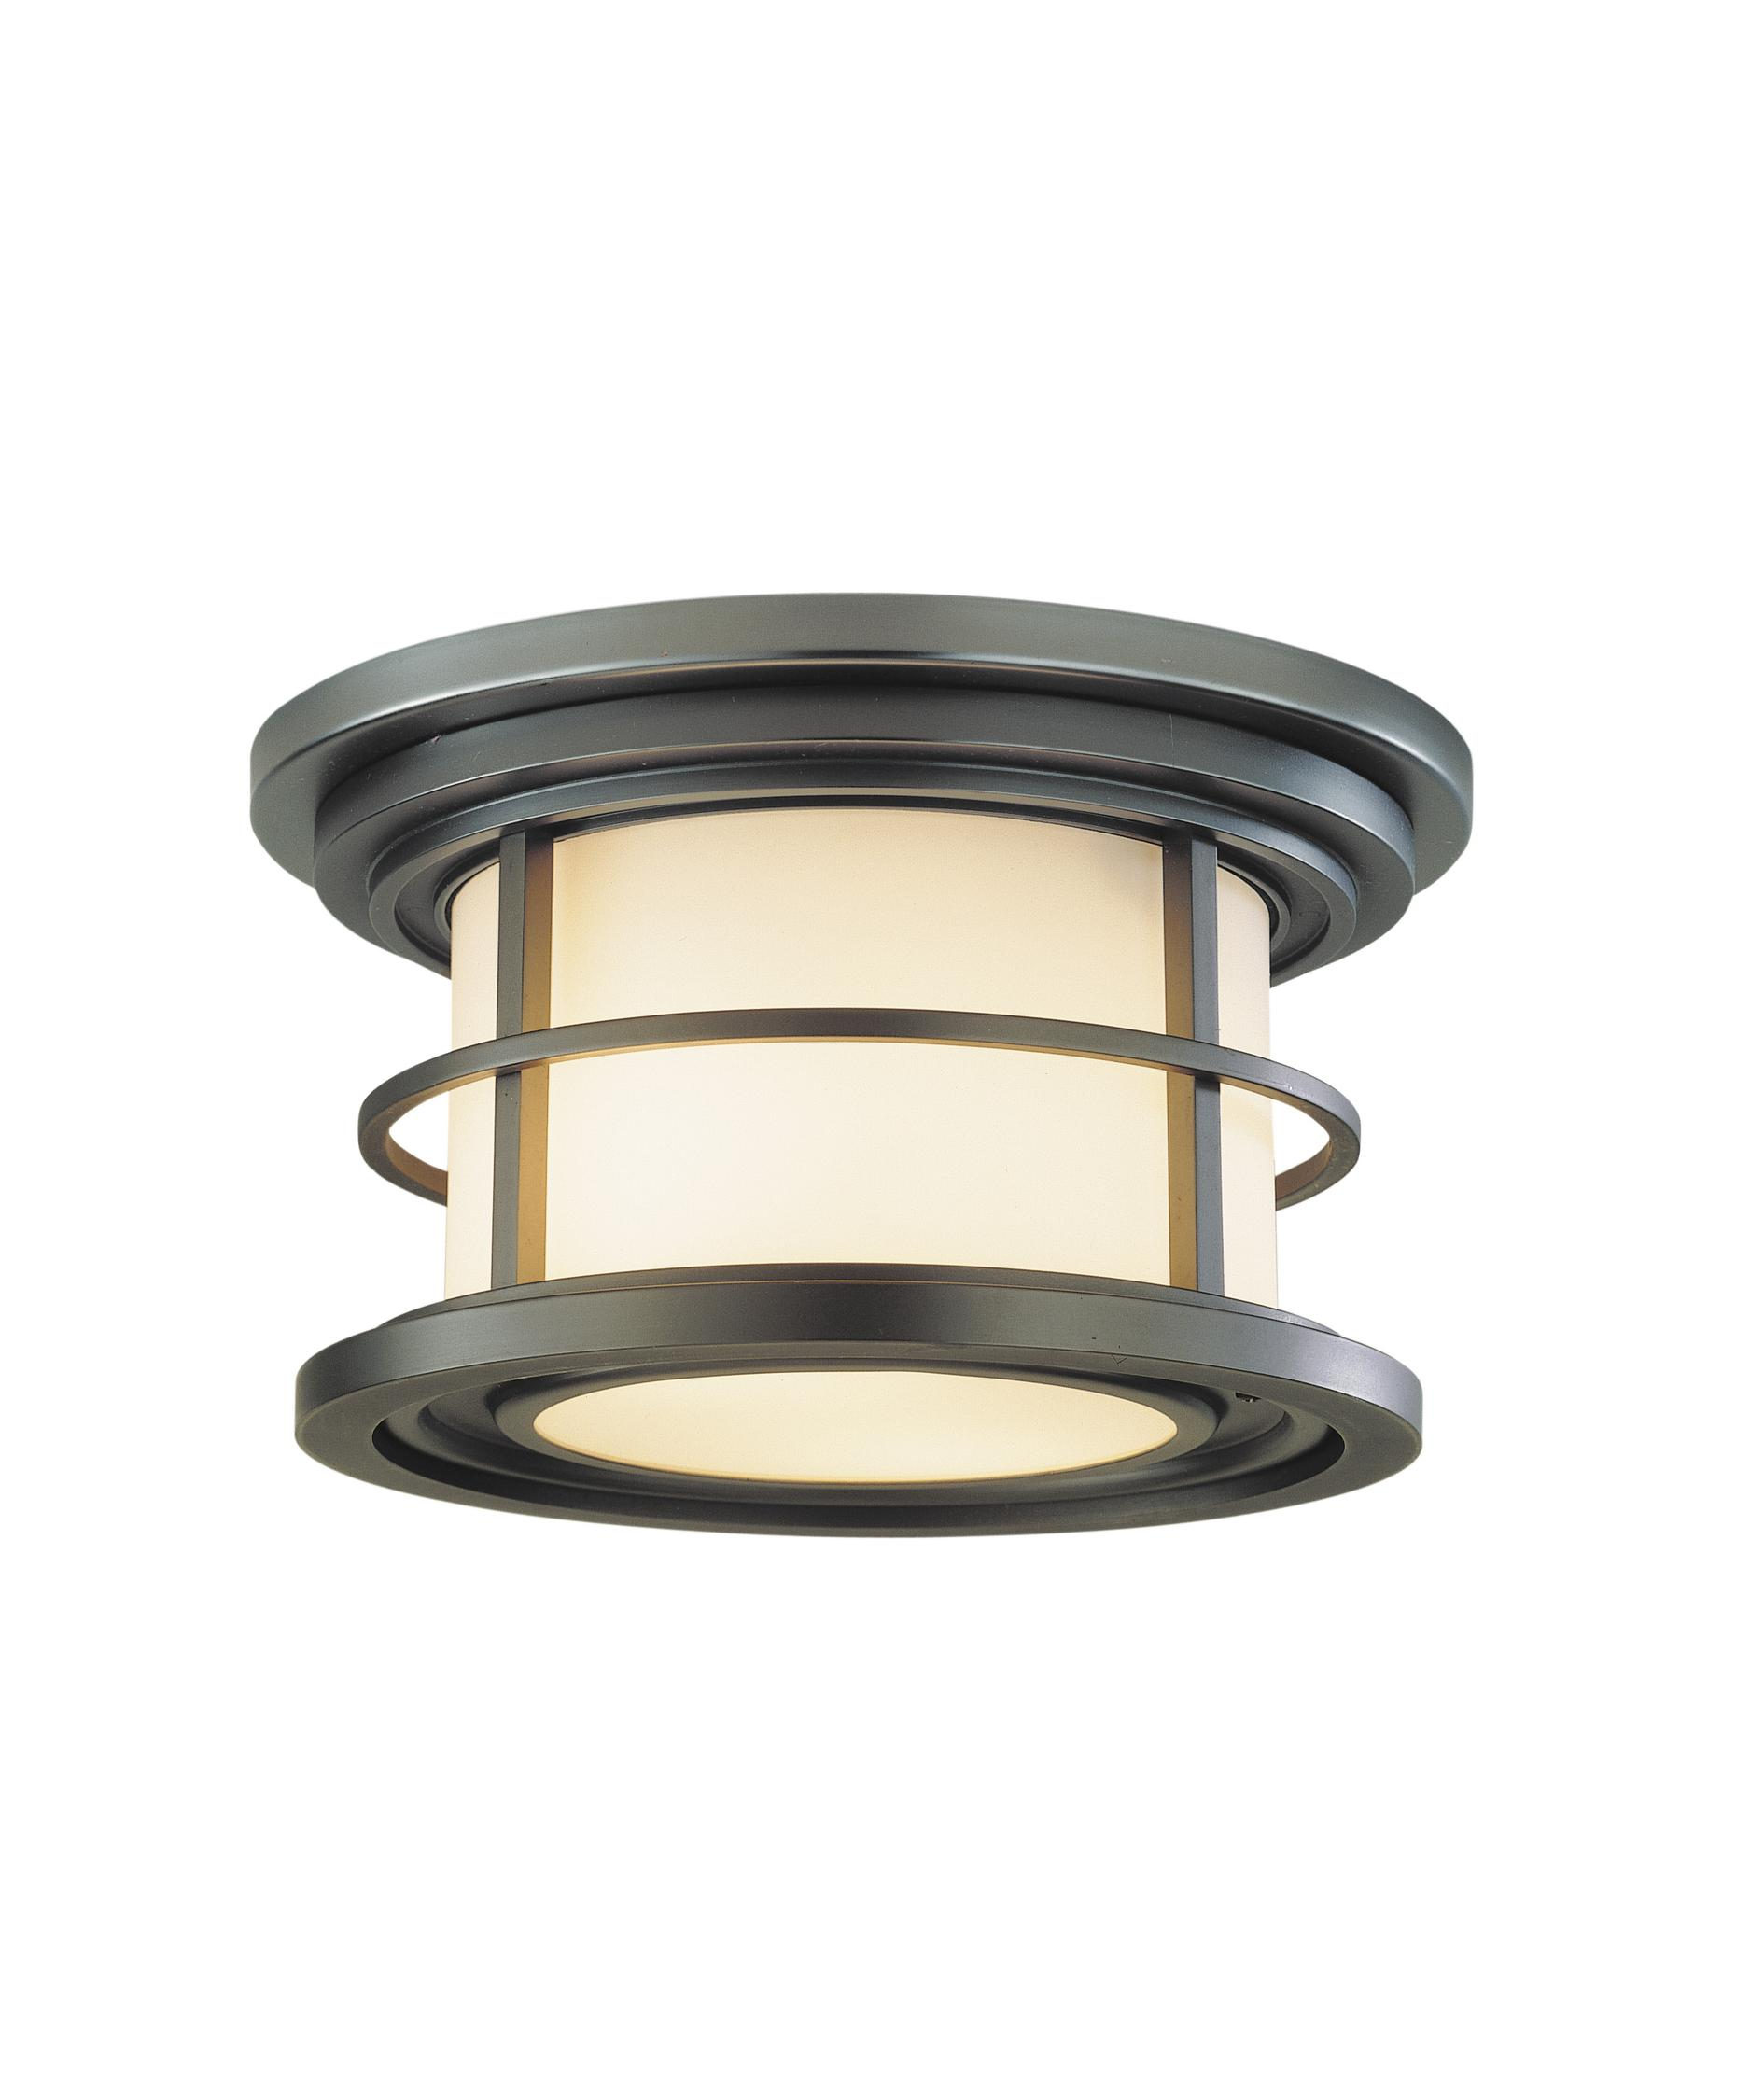 Flush mount outdoor lighting - Murray Feiss Ol2213 Lighthouse 10 Inch Wide 2 Light Outdoor Flush